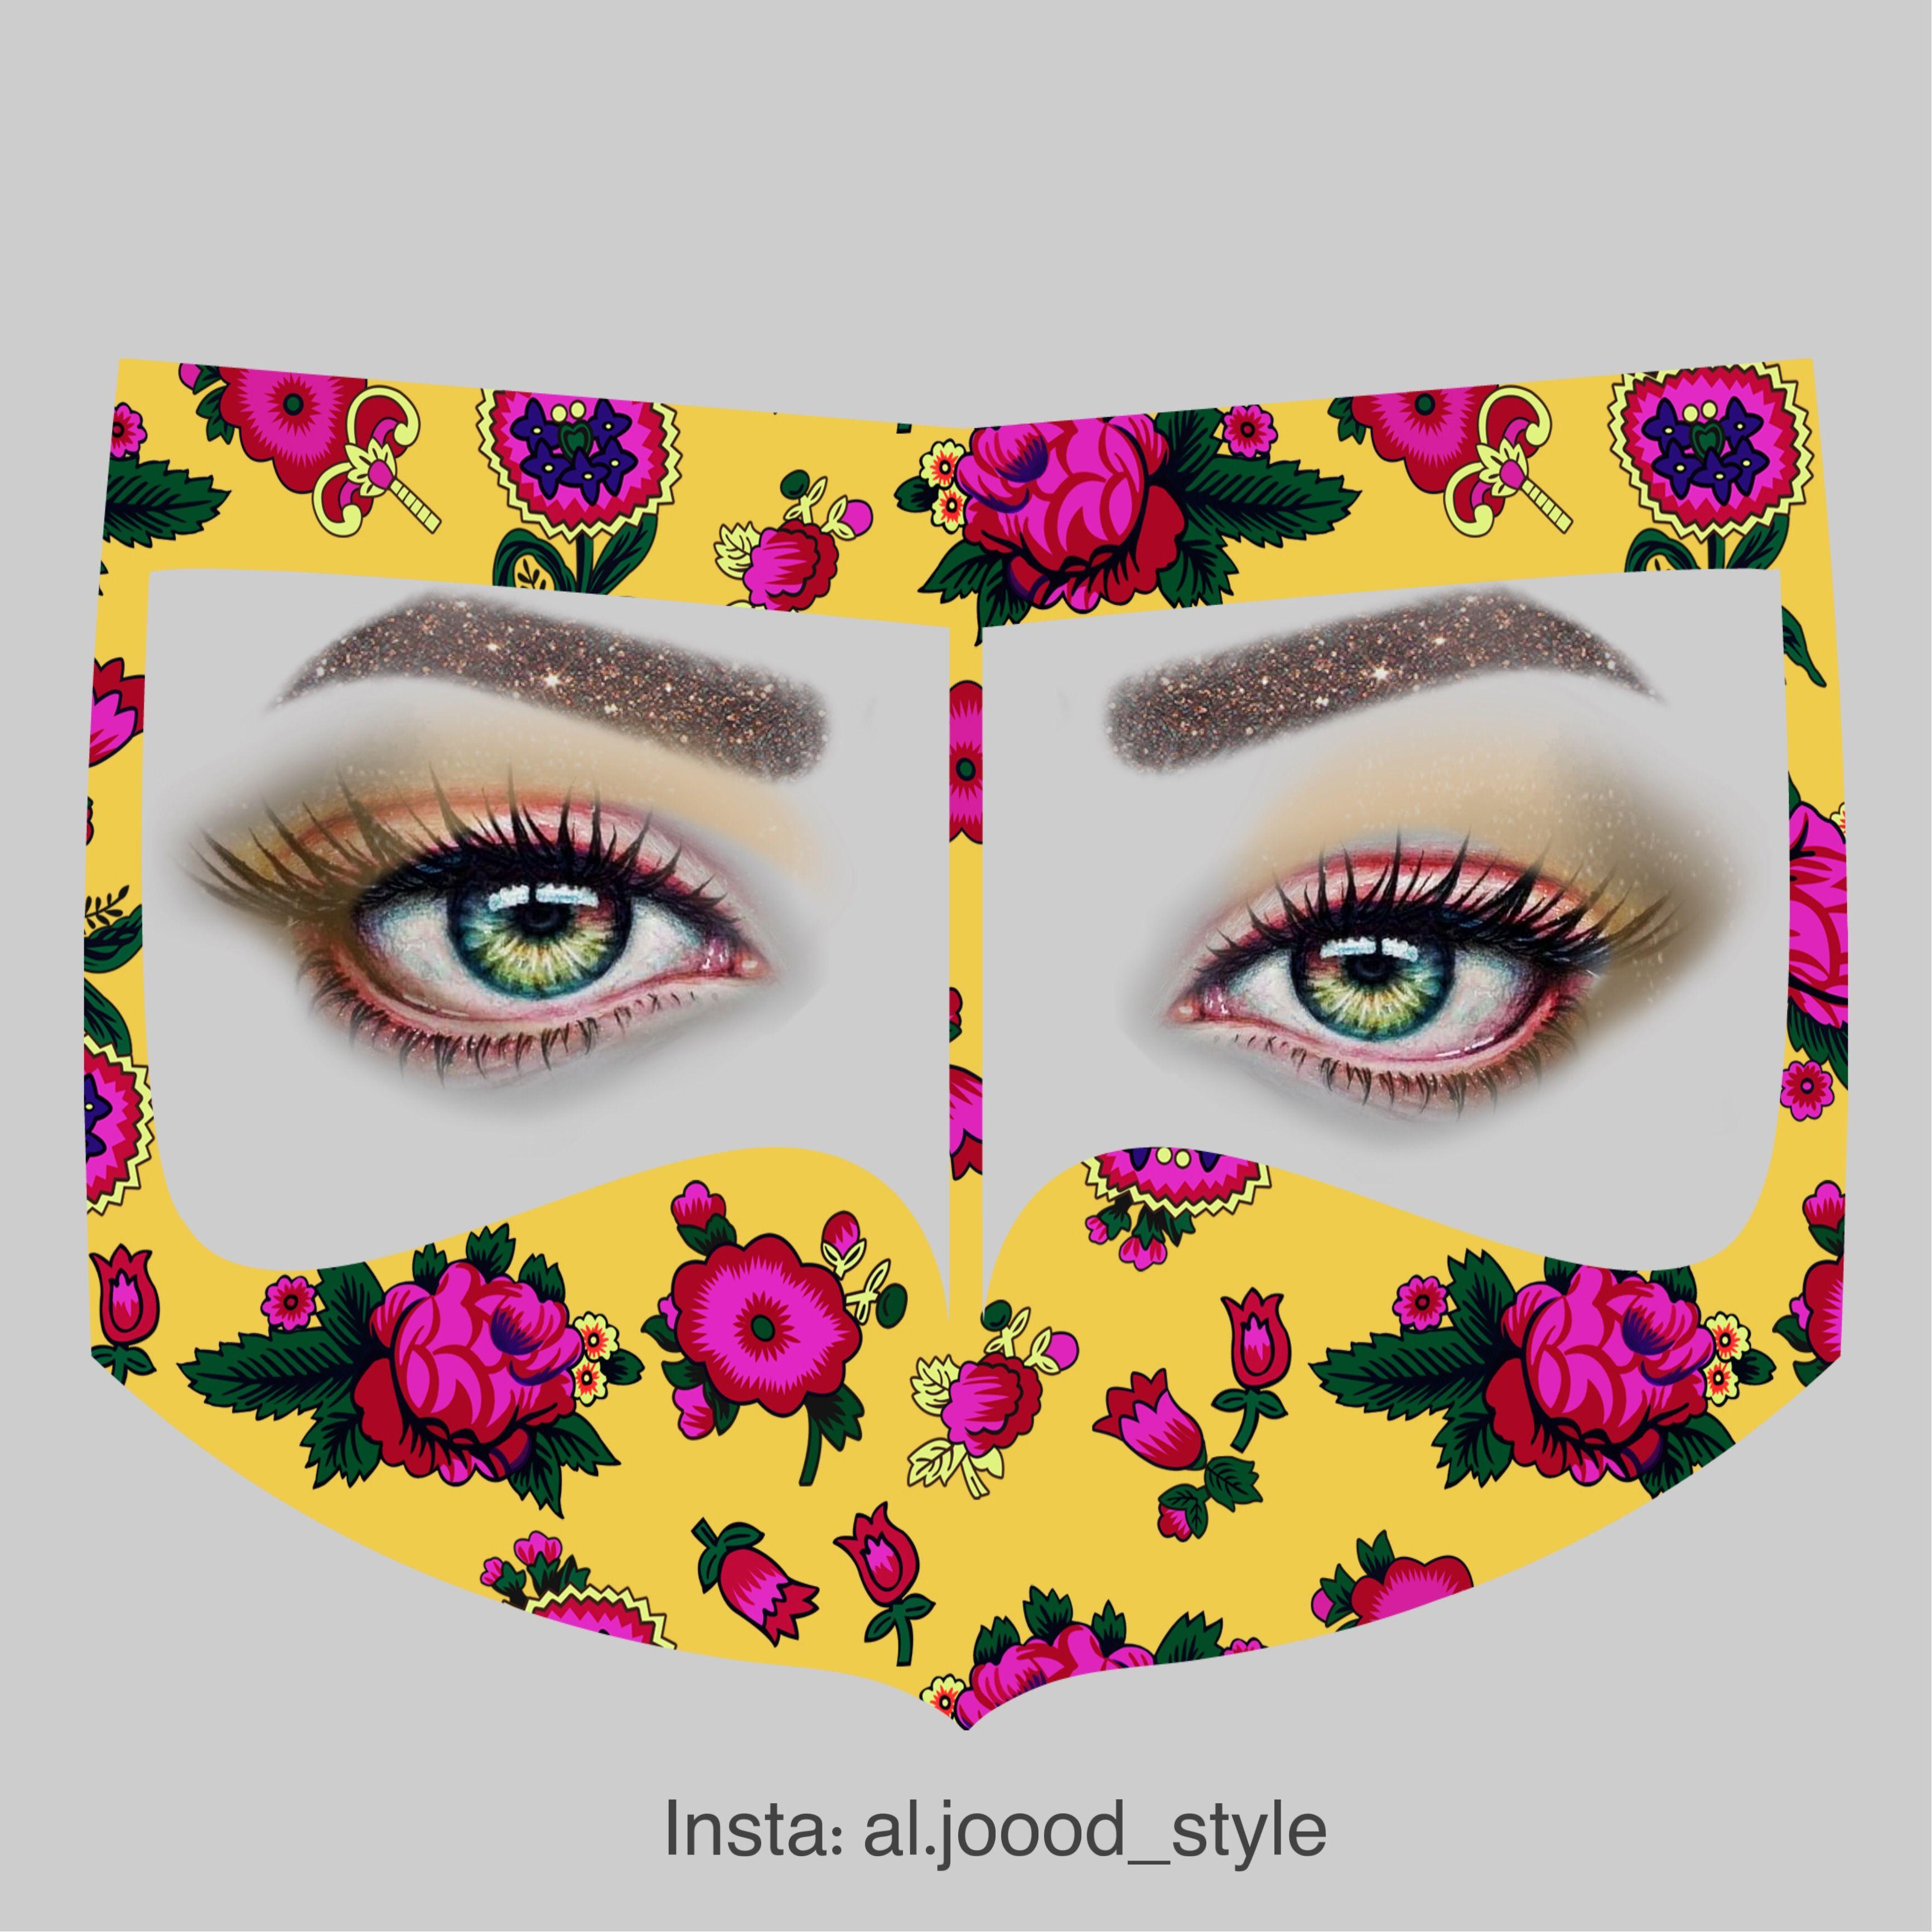 من اعمالنا Insta Al Joood Style Eid Crafts Eid Boxes Paper Crafts Diy